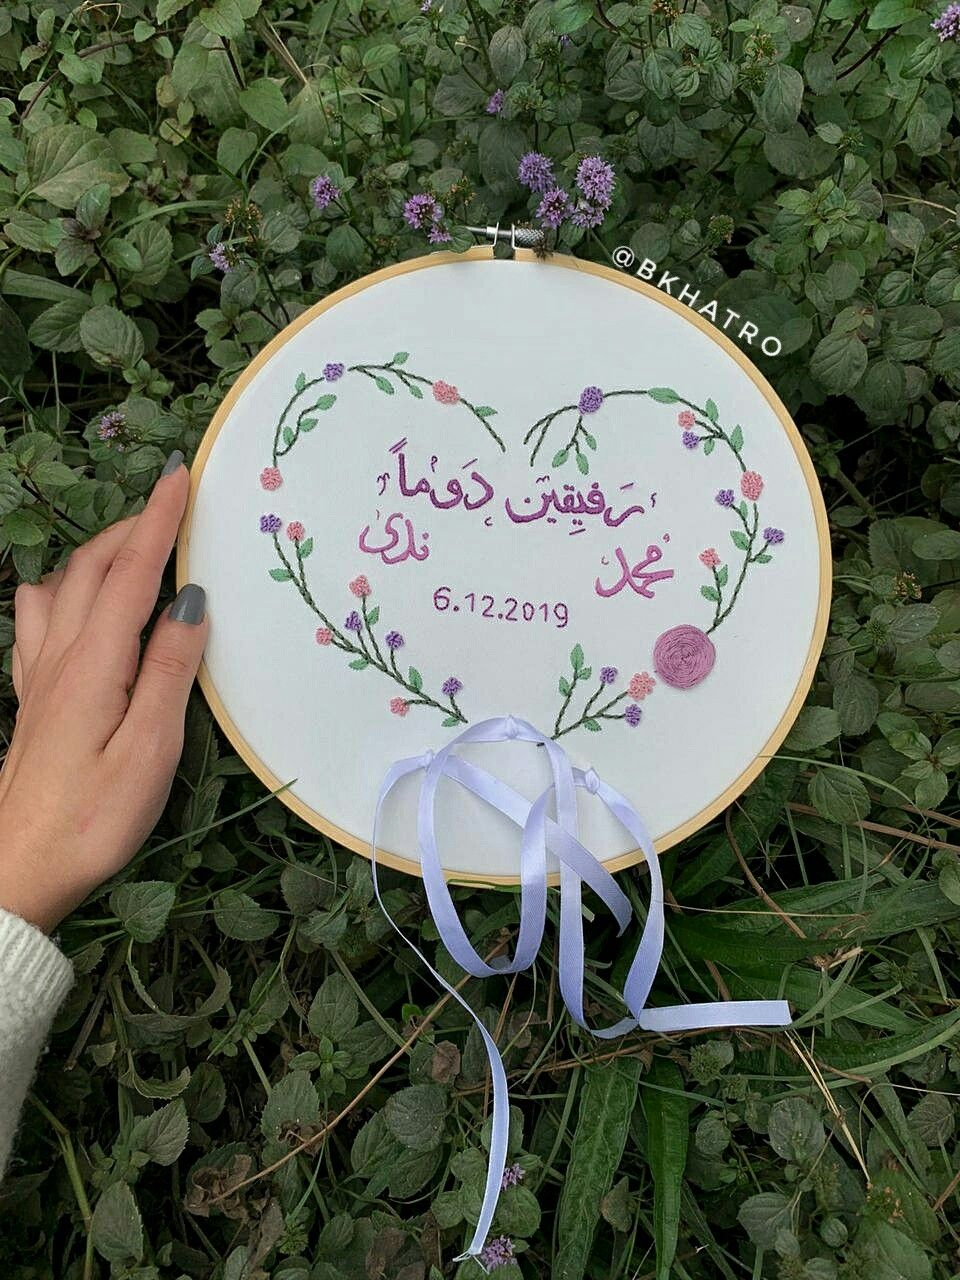 اطار تطريز يدوي لخطوبه بنفسجيات Christmas Ornaments Embroidery Hoop Embroidery